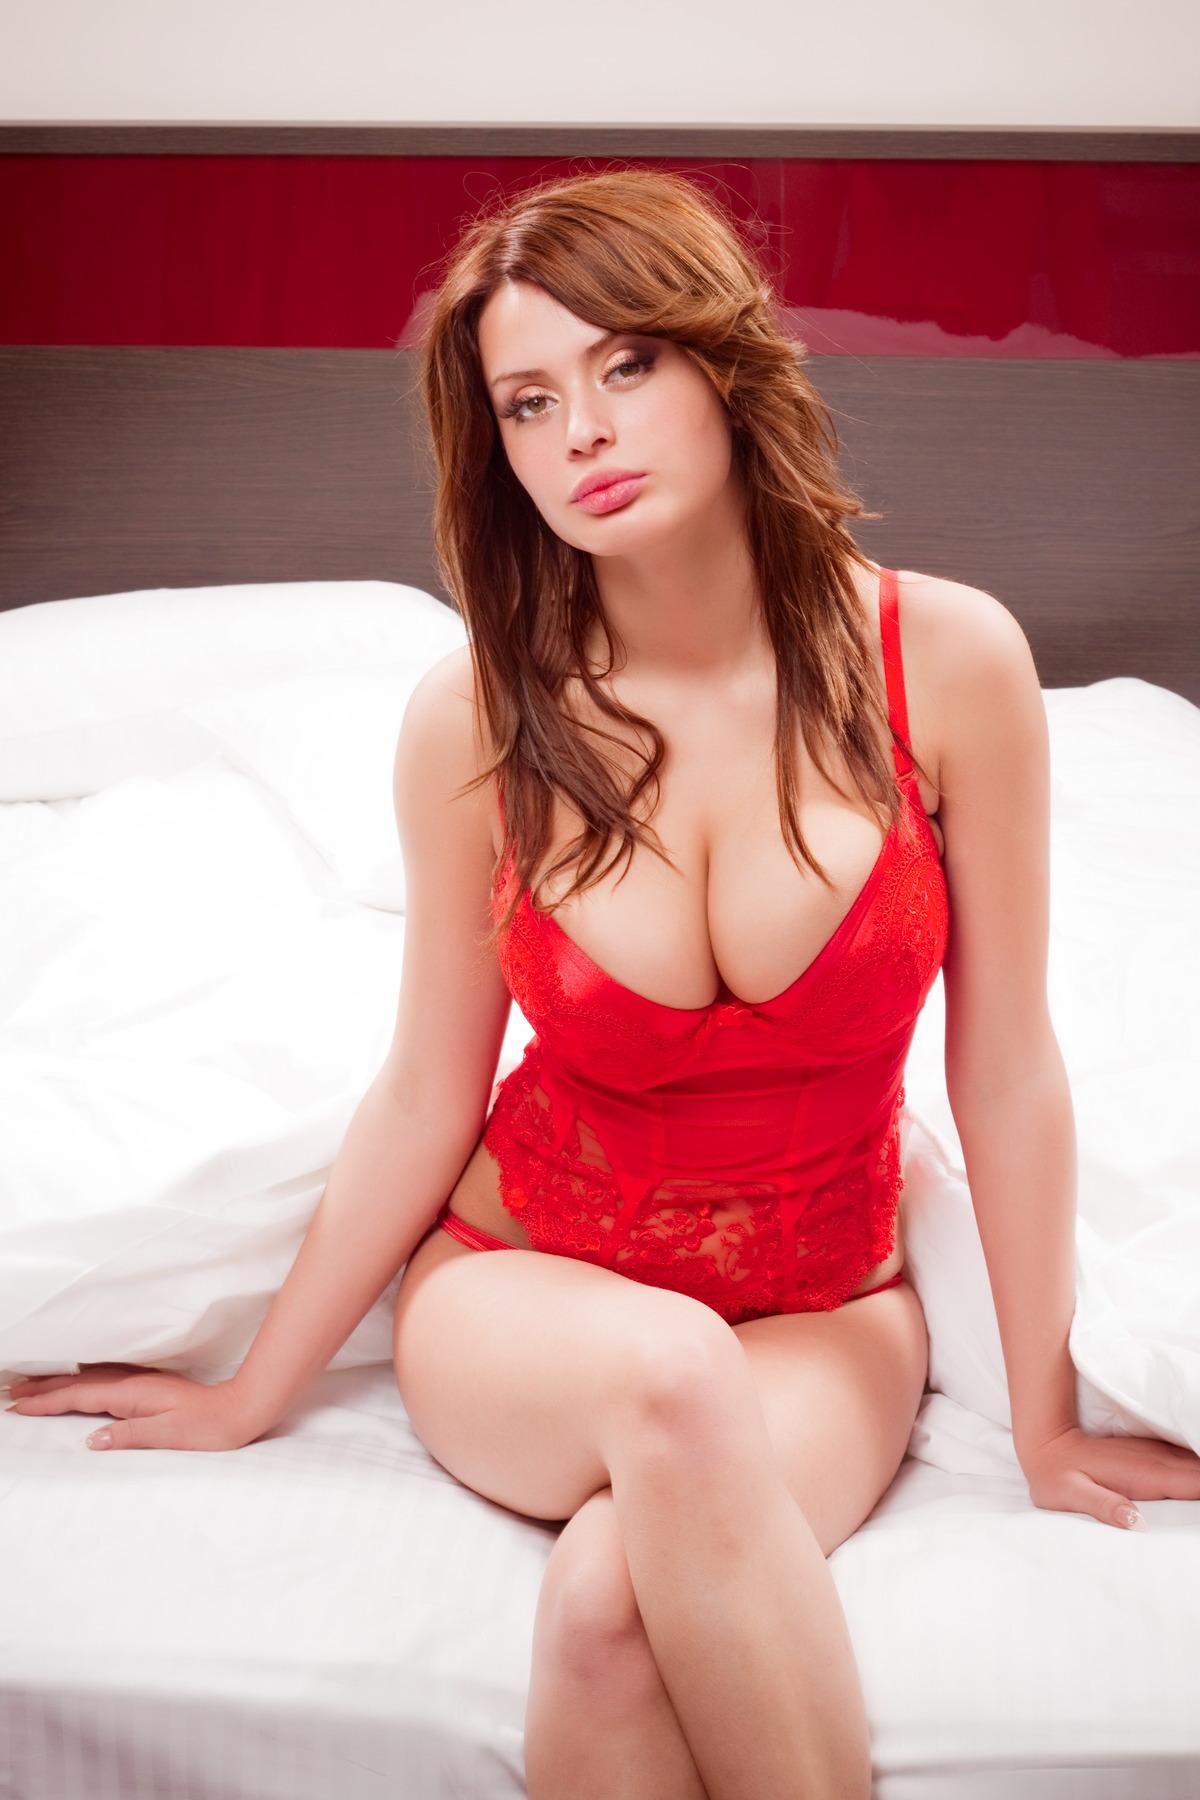 Sexy Girl ist bereit